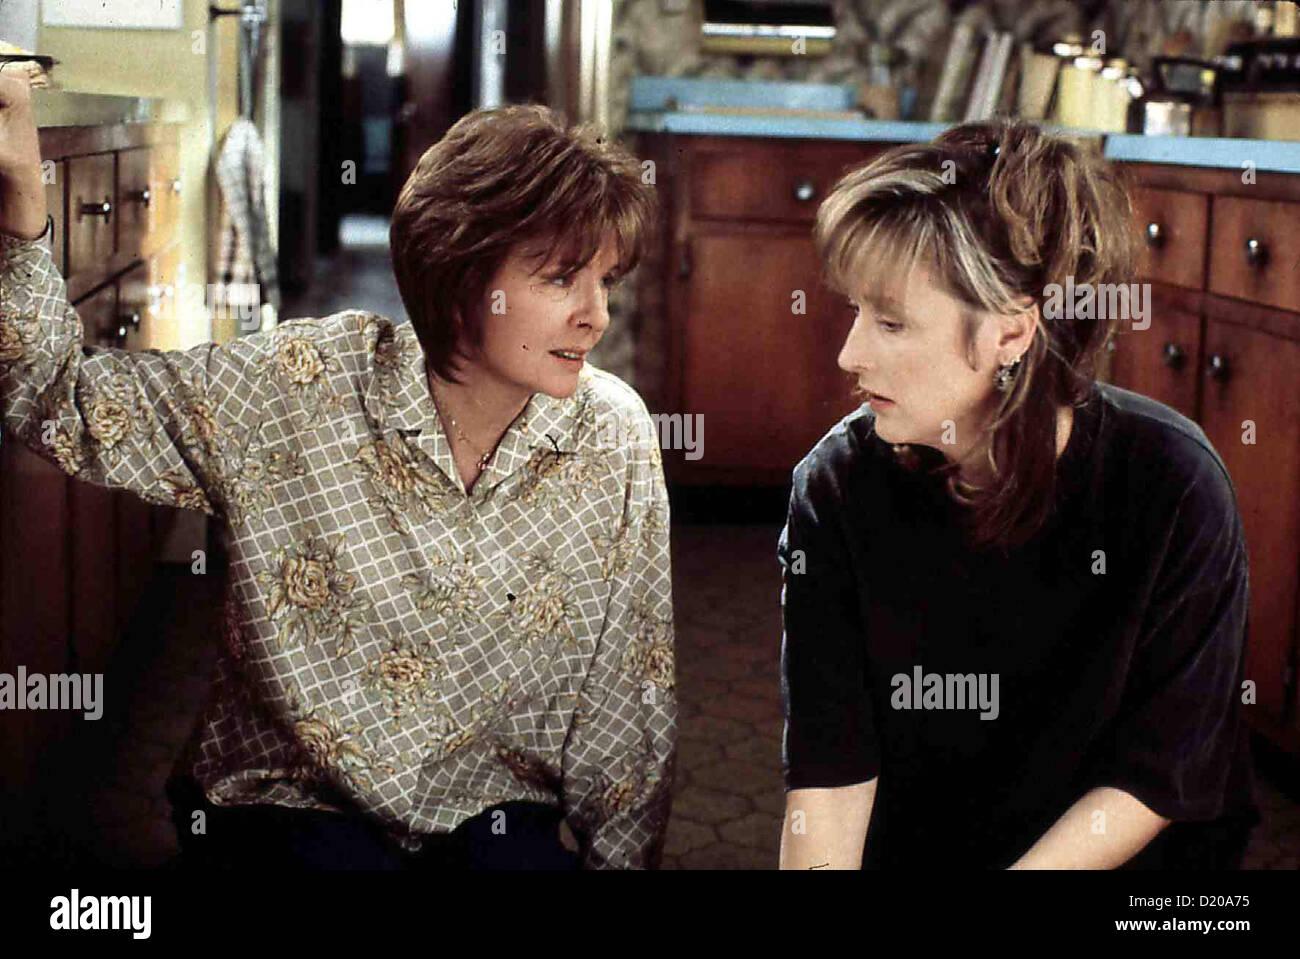 Marvin S Toechter Marvin S Room Diane Keaton Meryl Streep